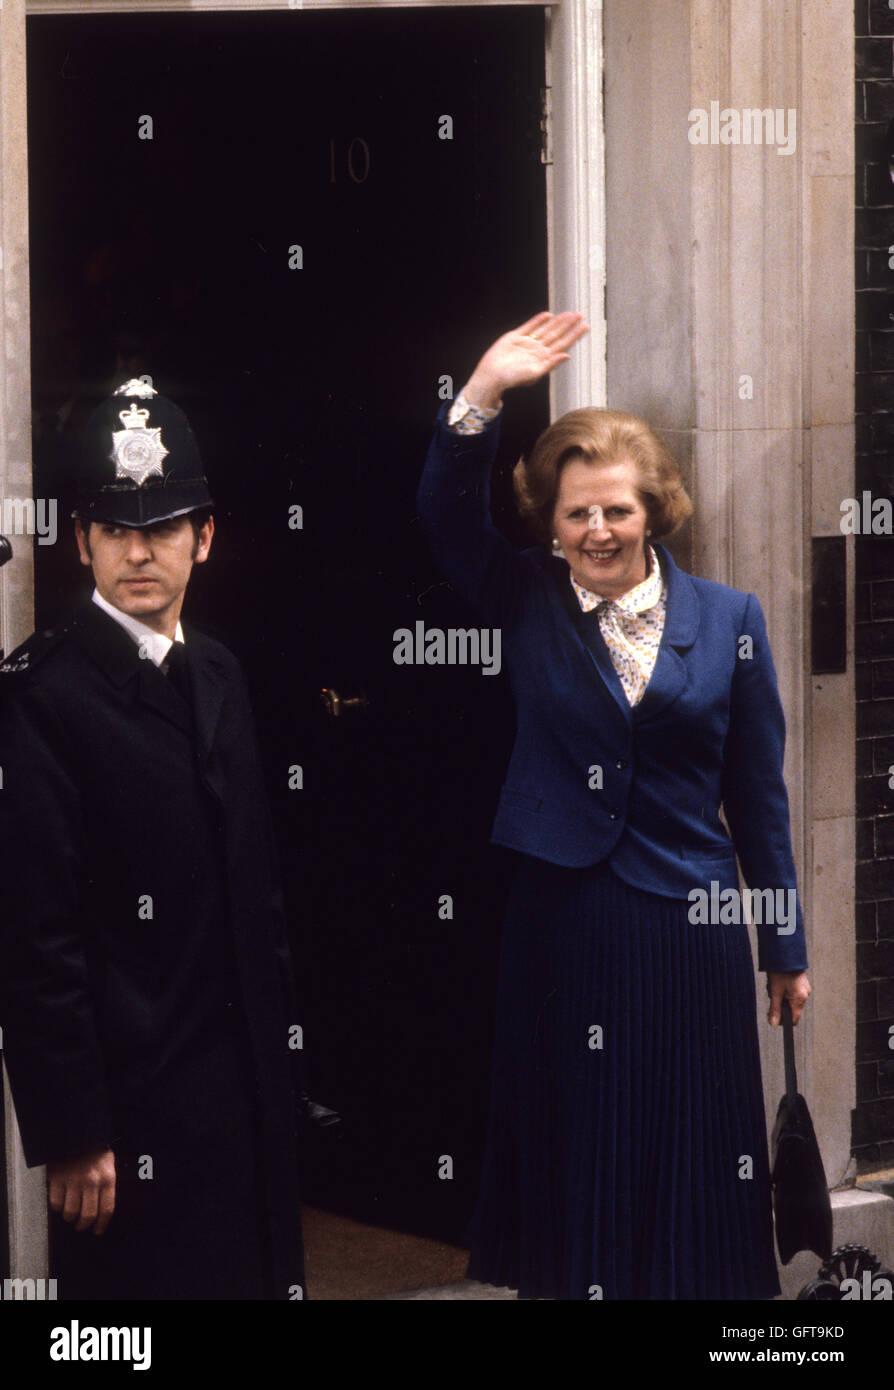 Margaret Thatcher 10 Downing Street London 1980s. HOMER SYKES - Stock Image